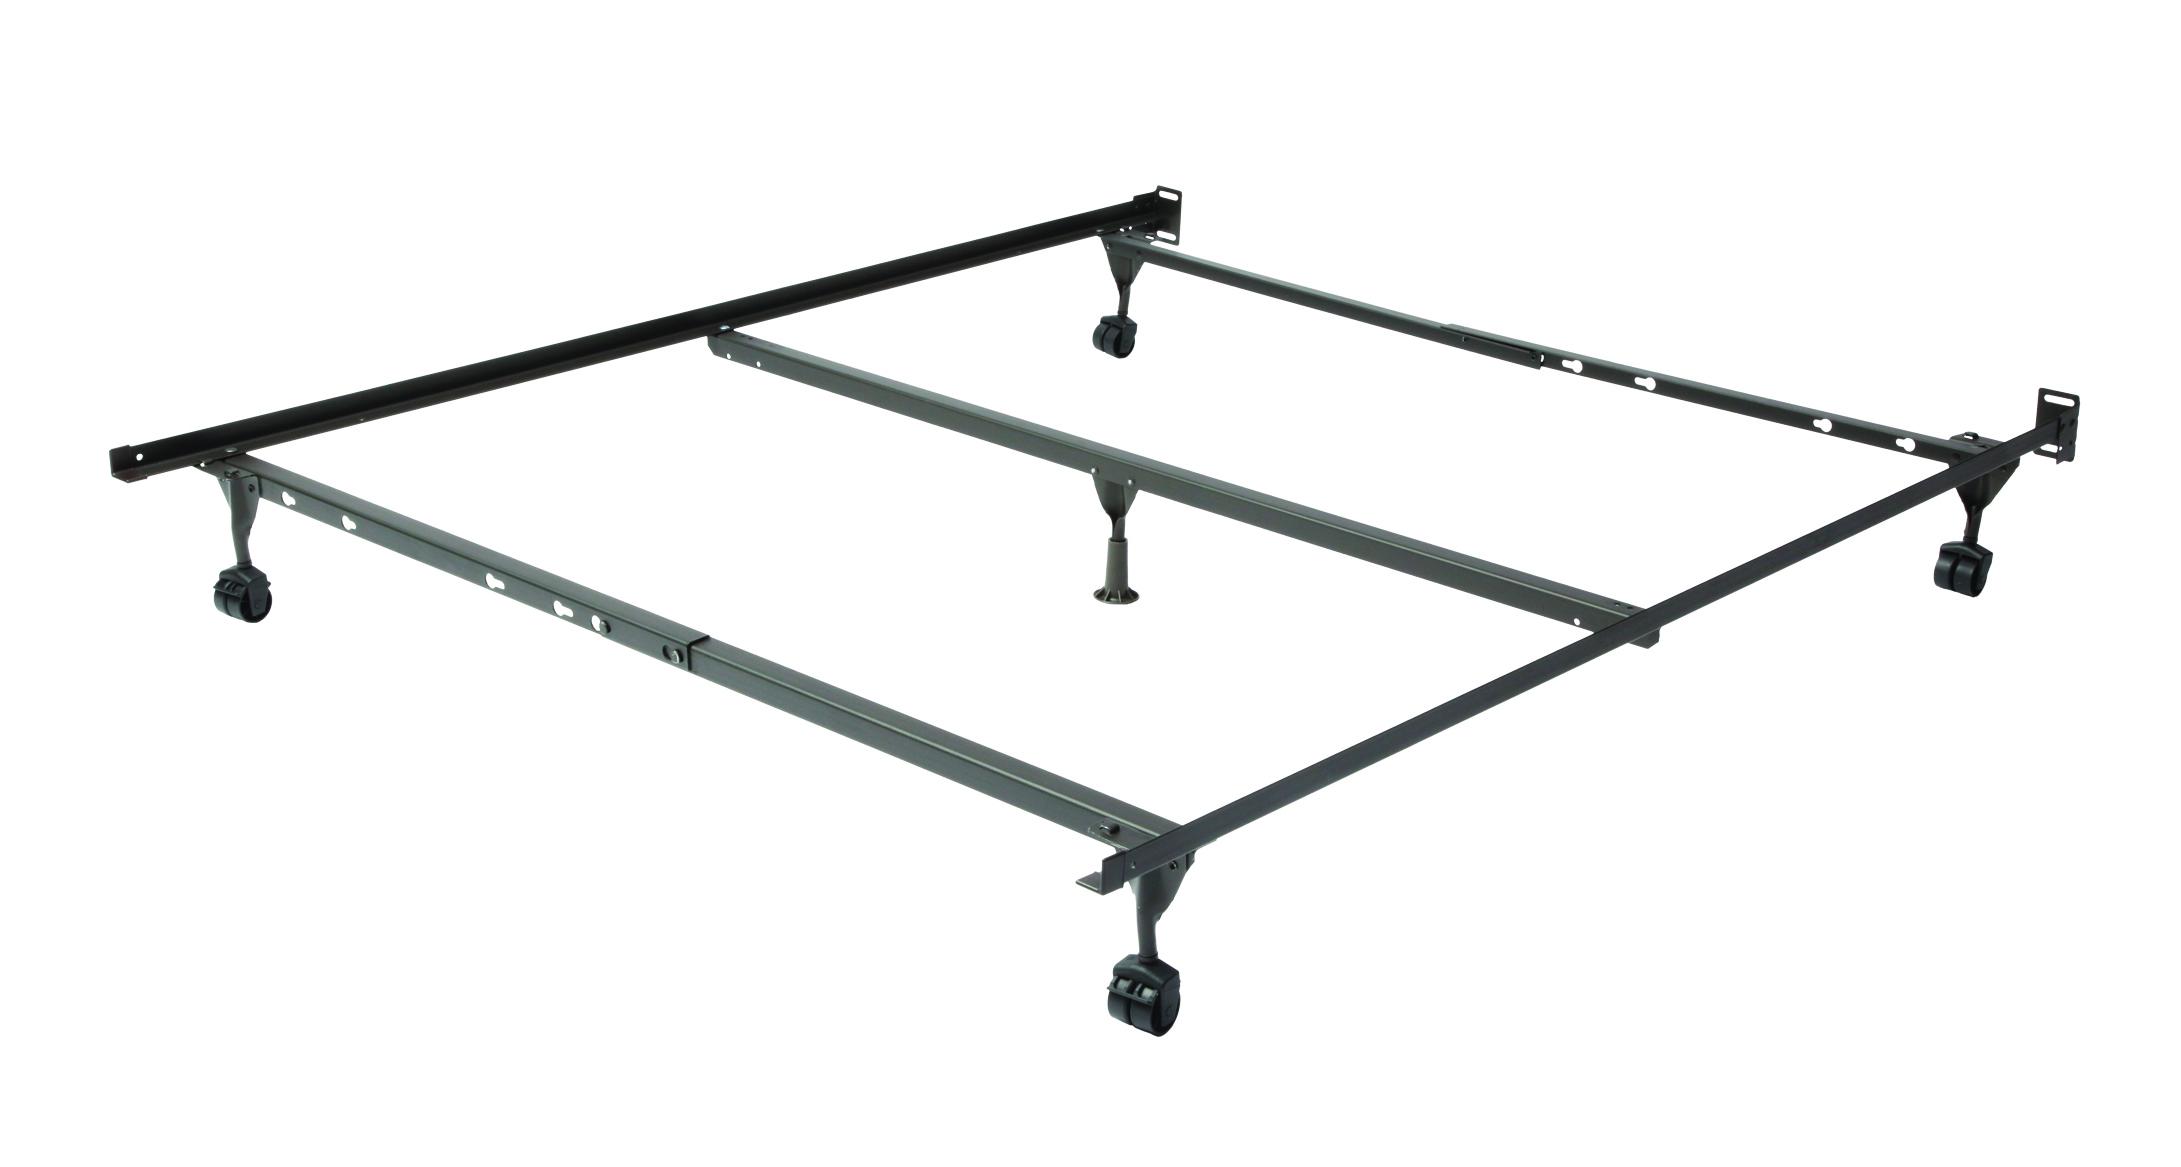 Mantua Insta-Lock I-115PR Queen Bed Frame